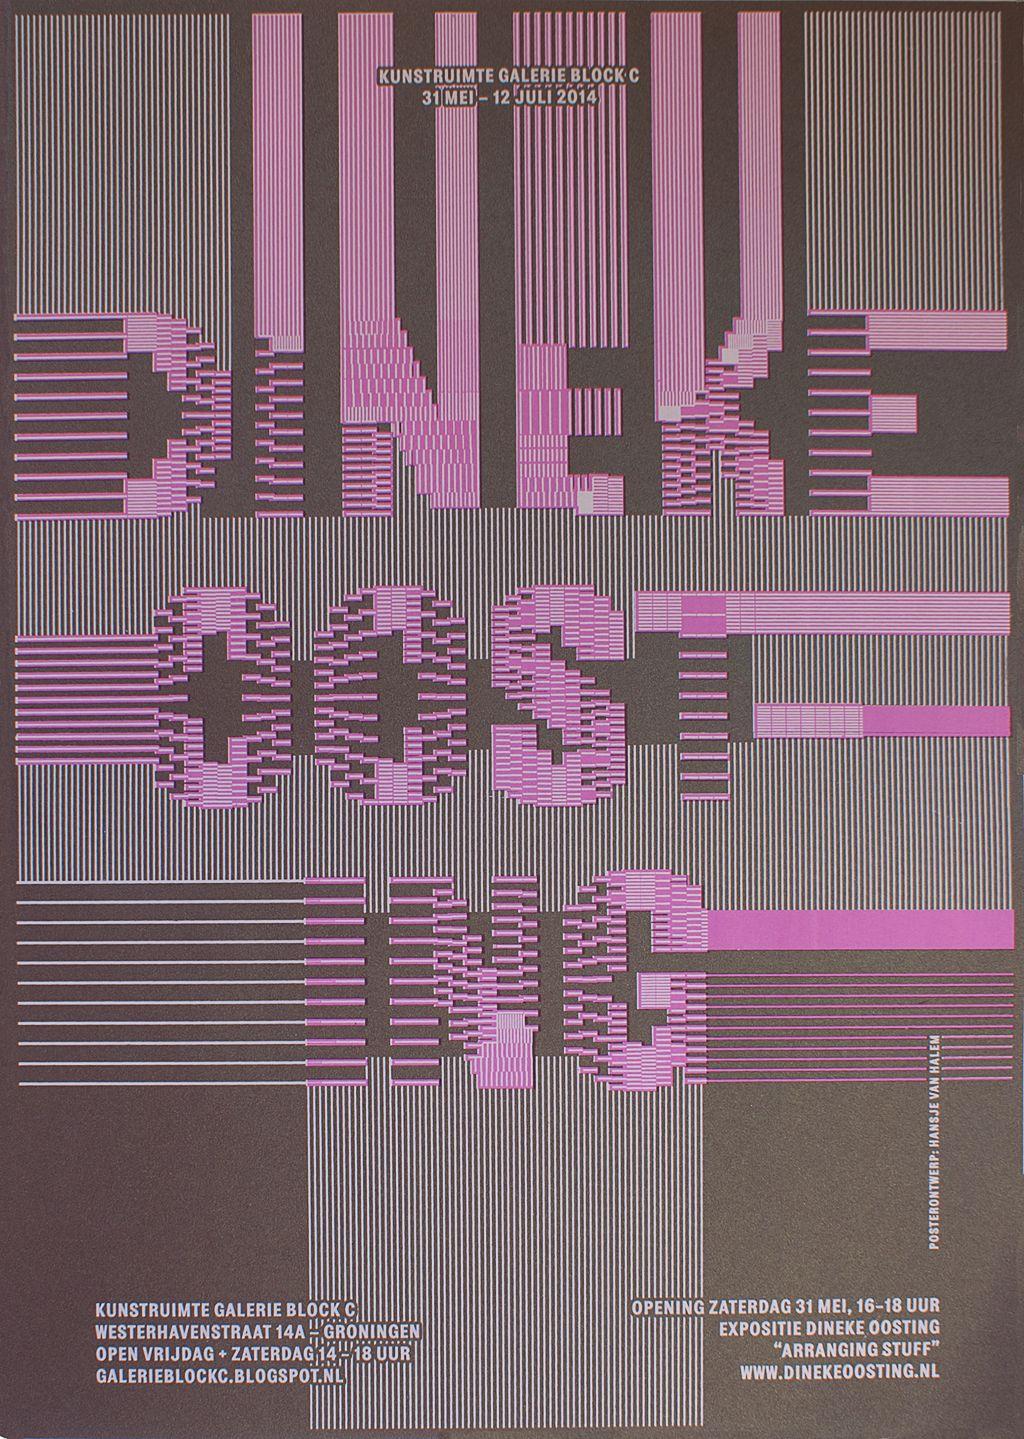 Galerie Block C Poster for Dineke Oosting - www.hansje.net